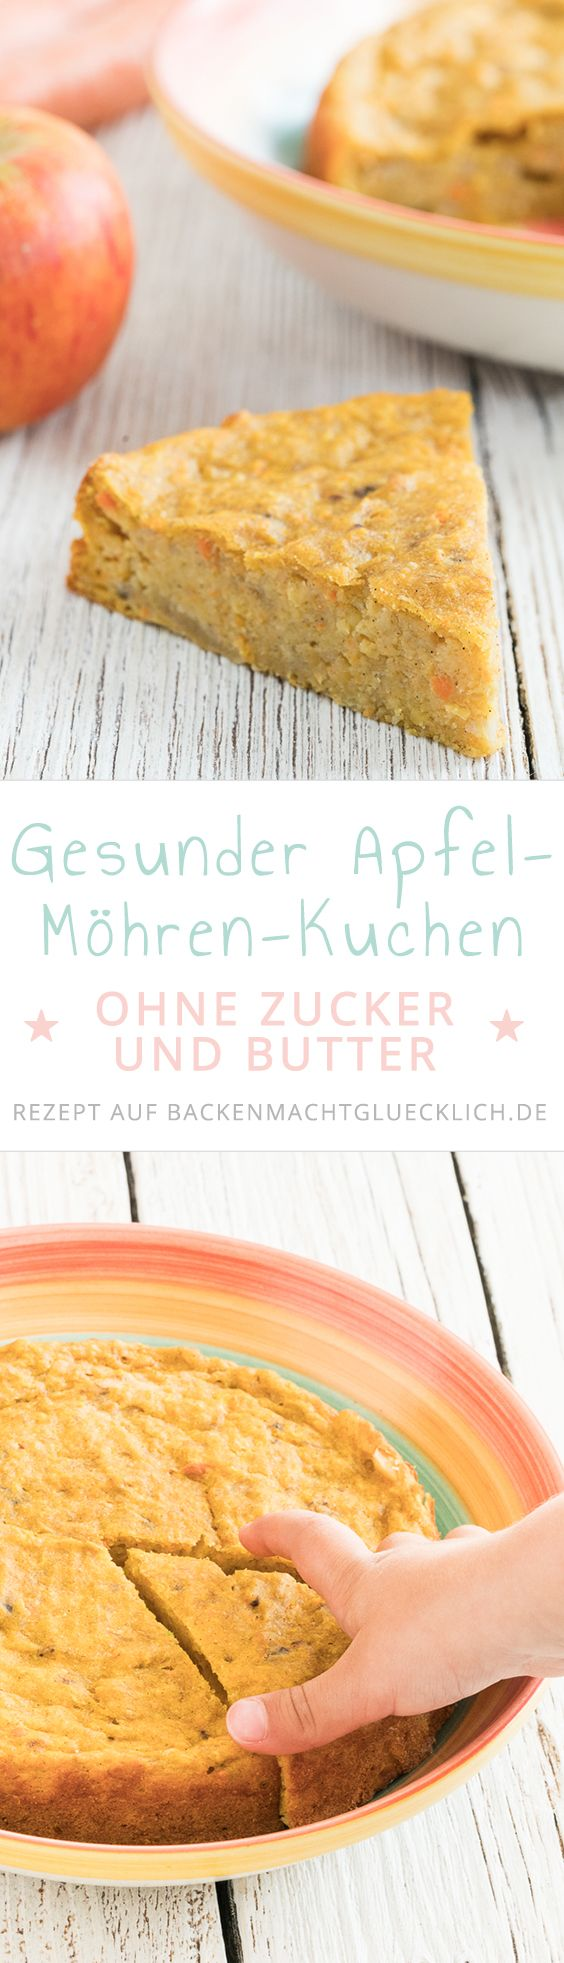 Apfel Mohren Kuchen Ohne Zucker Rezept Vegan Meals Carrot Cake